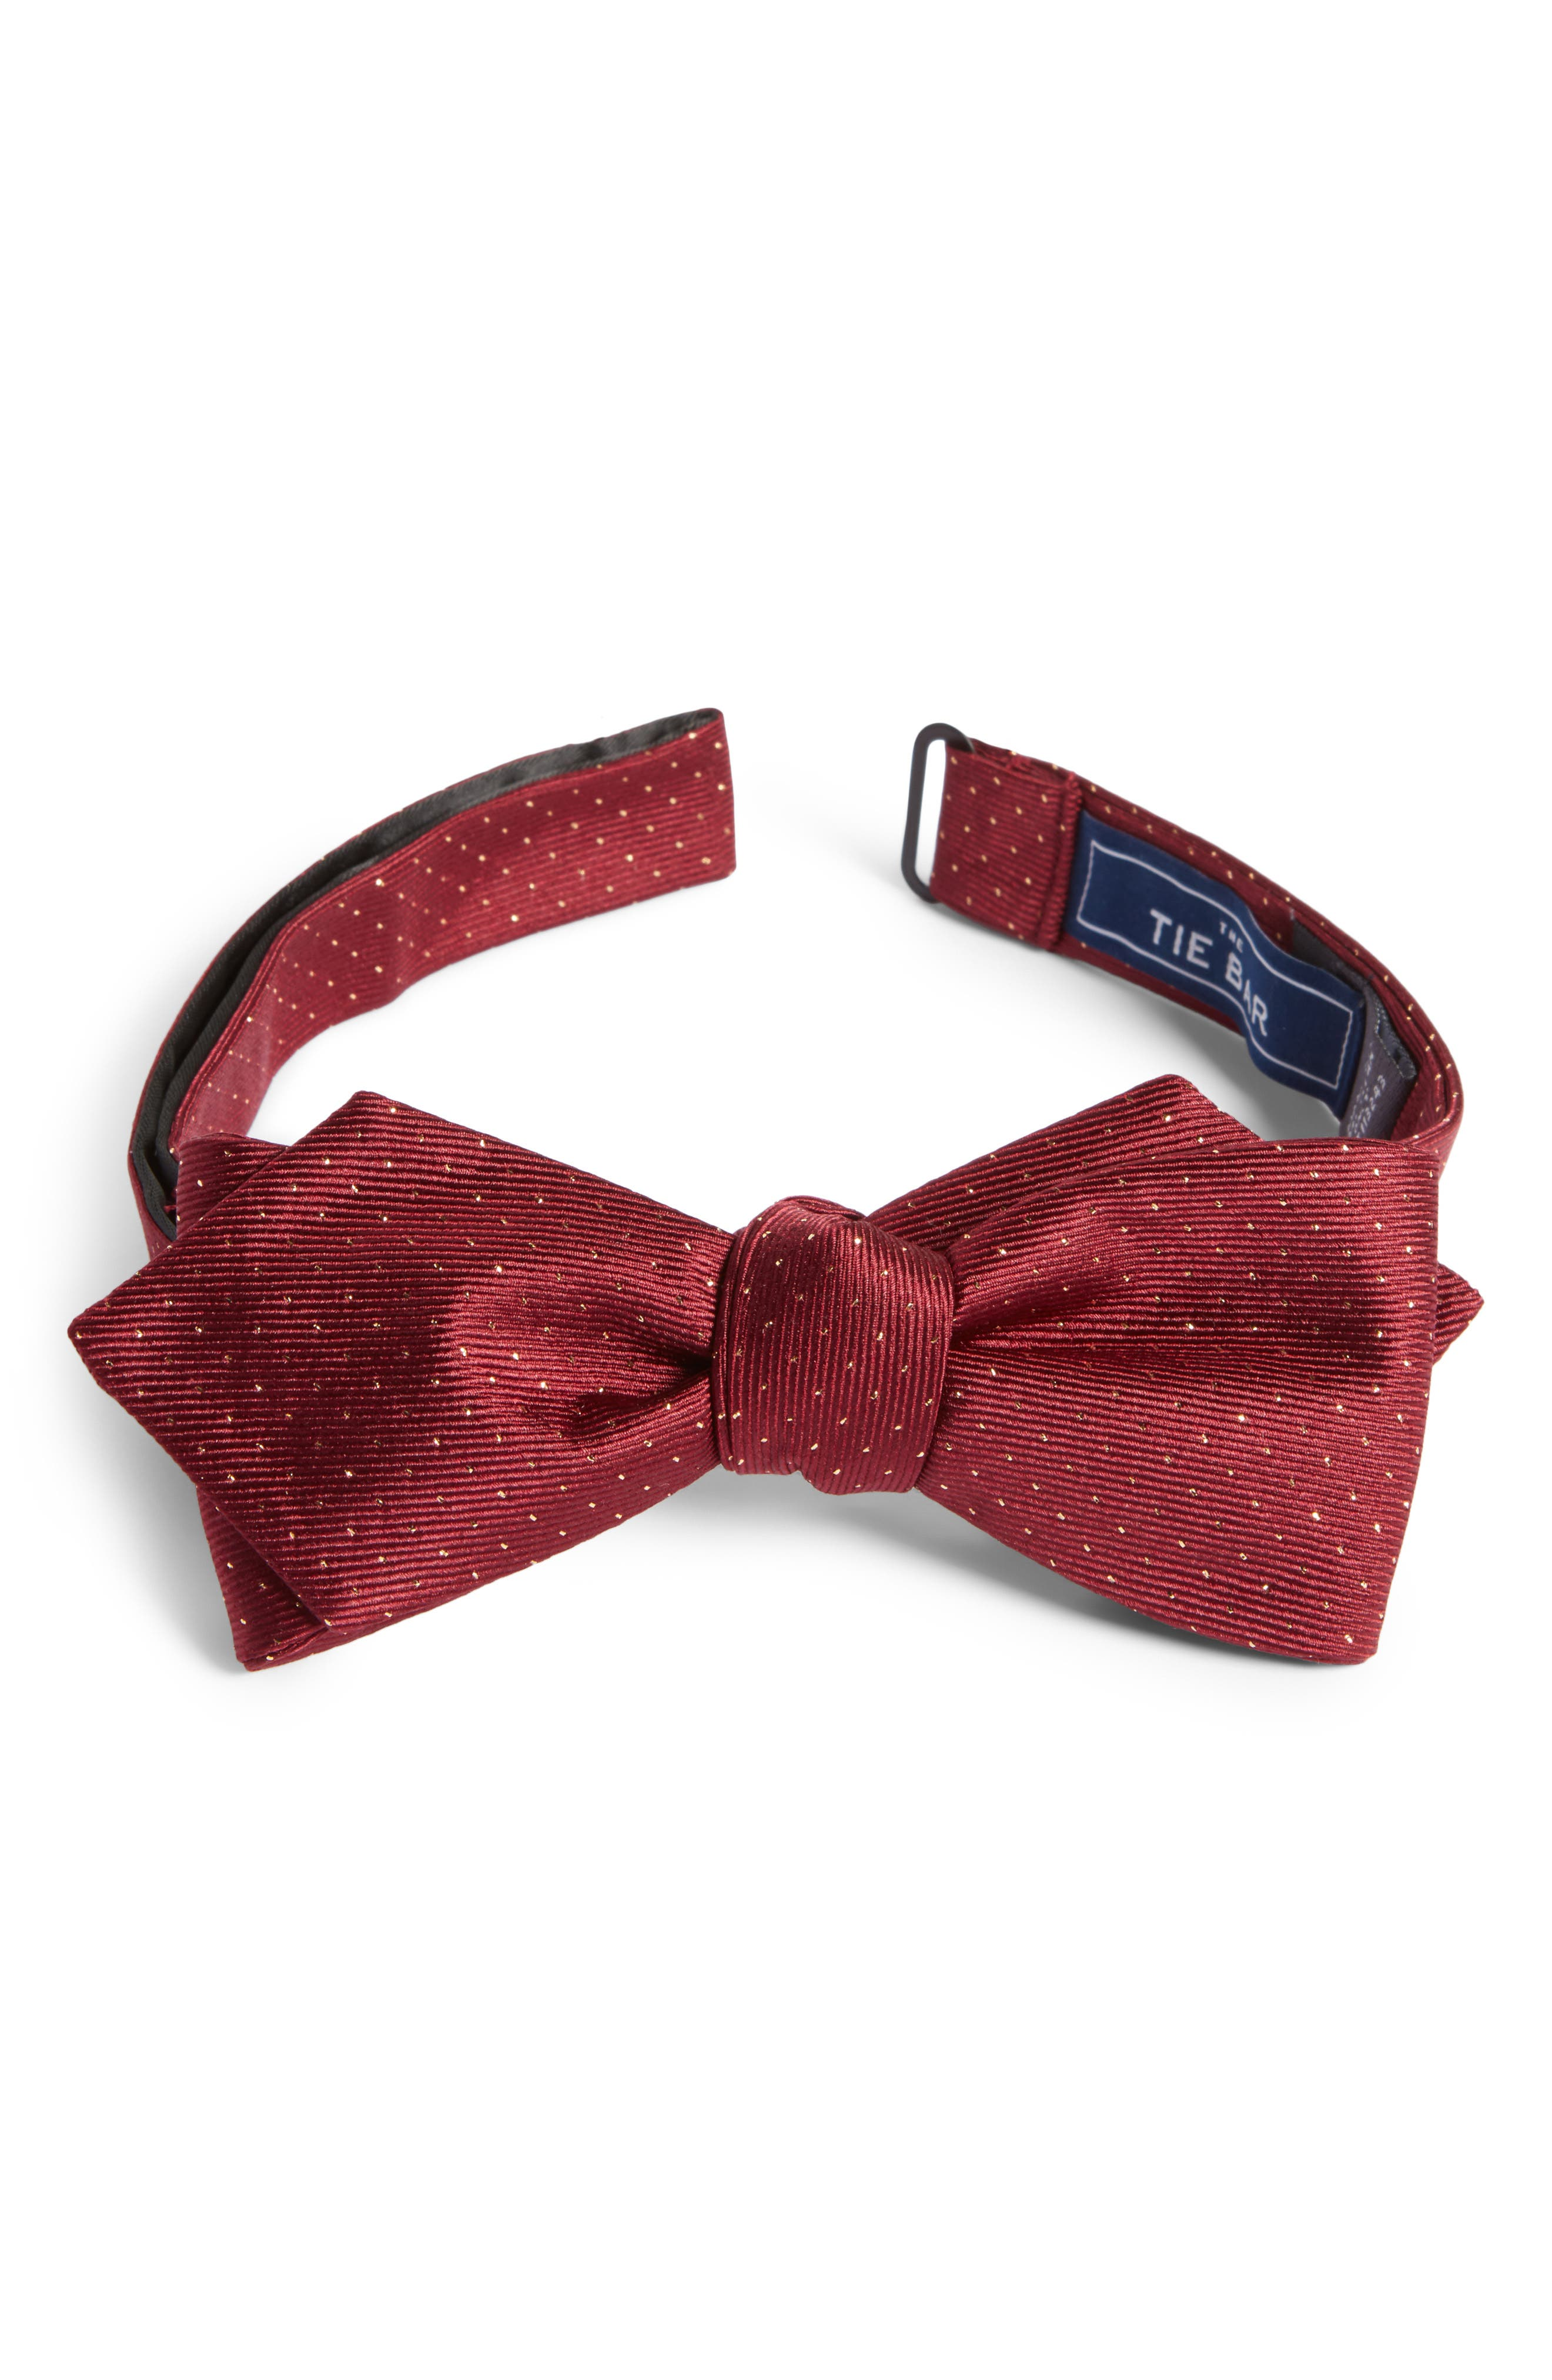 Flicker Self Bow Tie,                             Main thumbnail 1, color,                             Burgundy